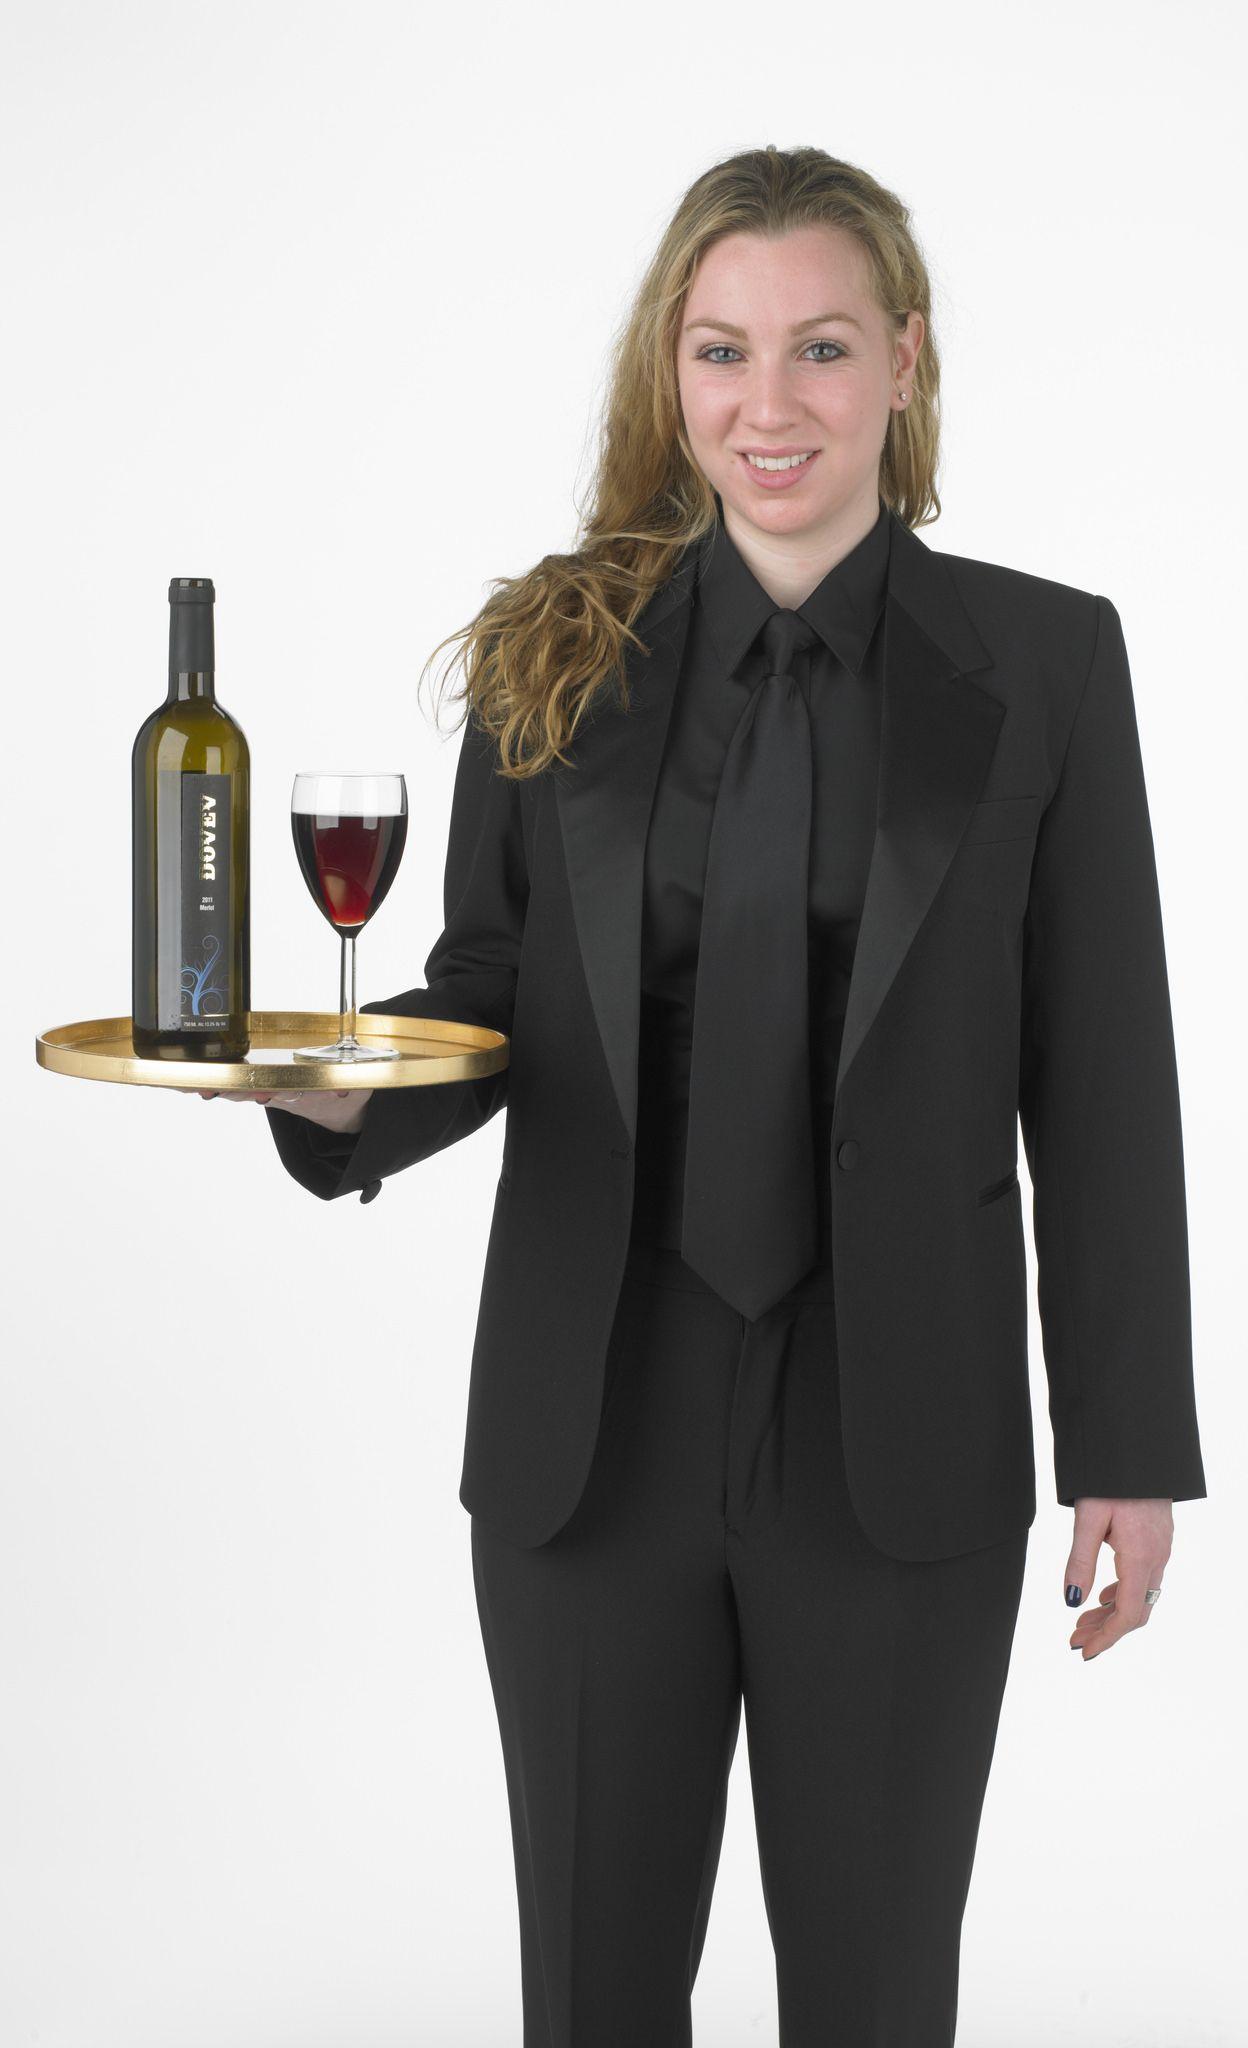 https://flic.kr/p/HTVgAz | All Black Waitresses Uniform